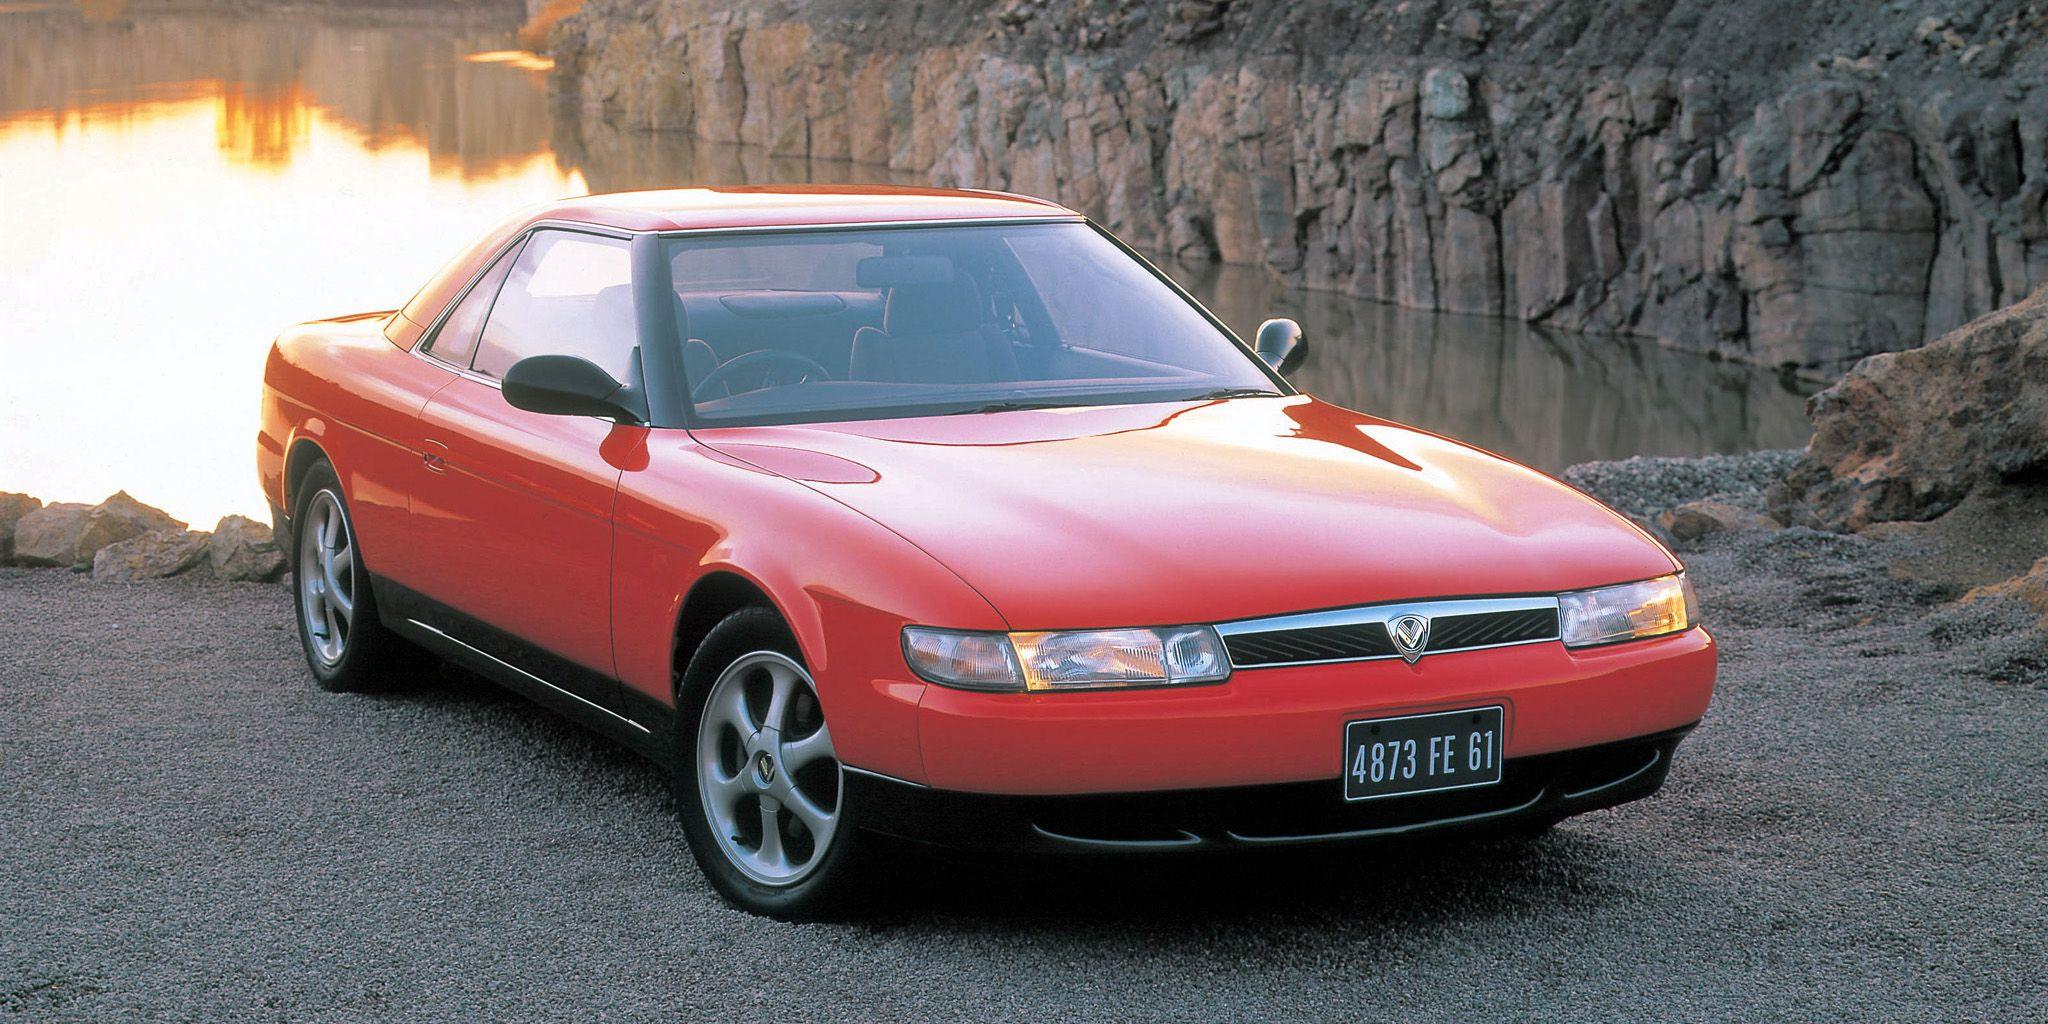 1450470568-pictures-mazda-cosmo-1990-1 Cozy Lotus Carlton for Sale In Australia Cars Trend